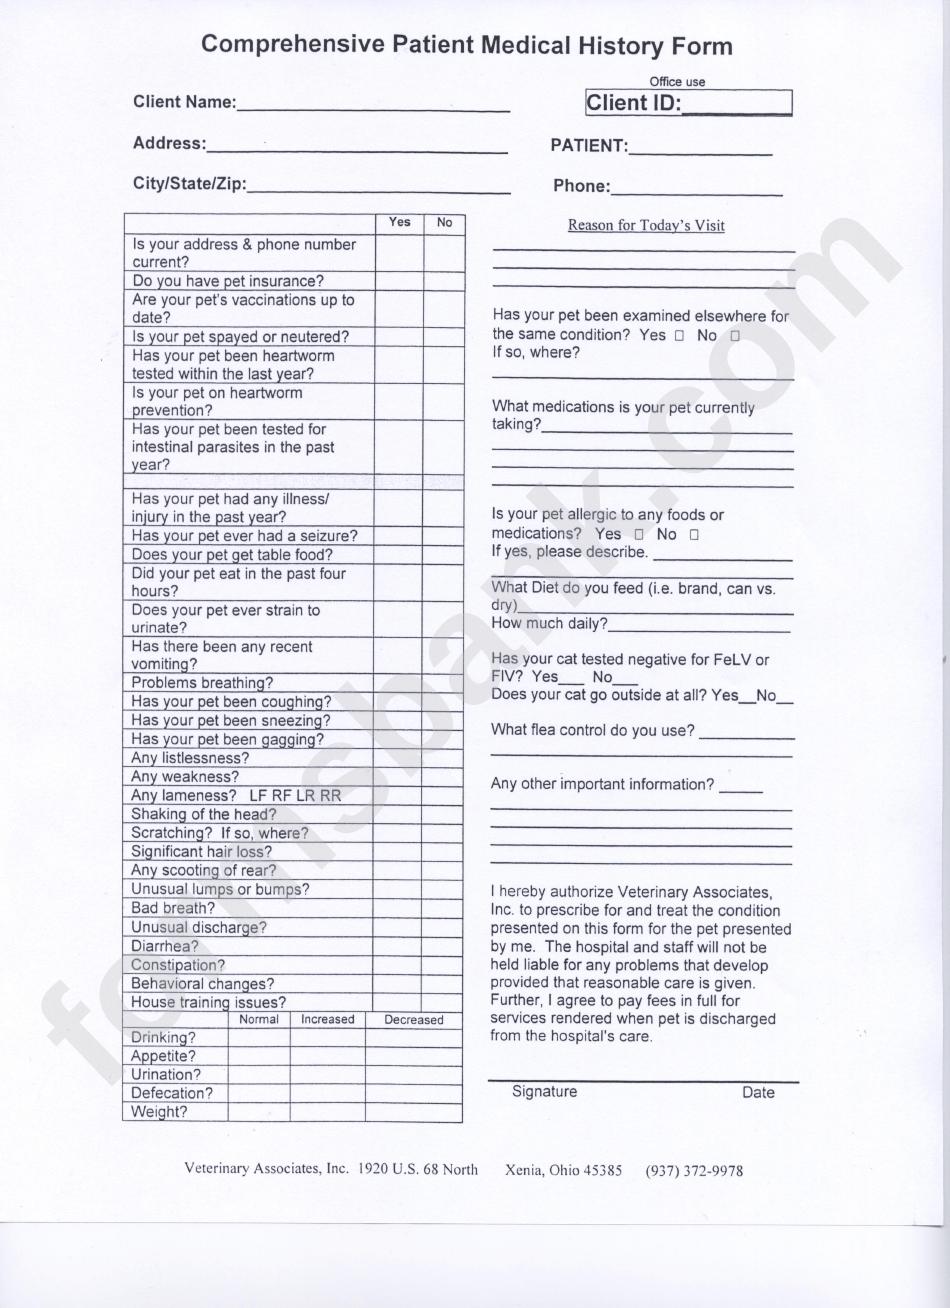 Comprehensive Patient Medical History Form printable pdf